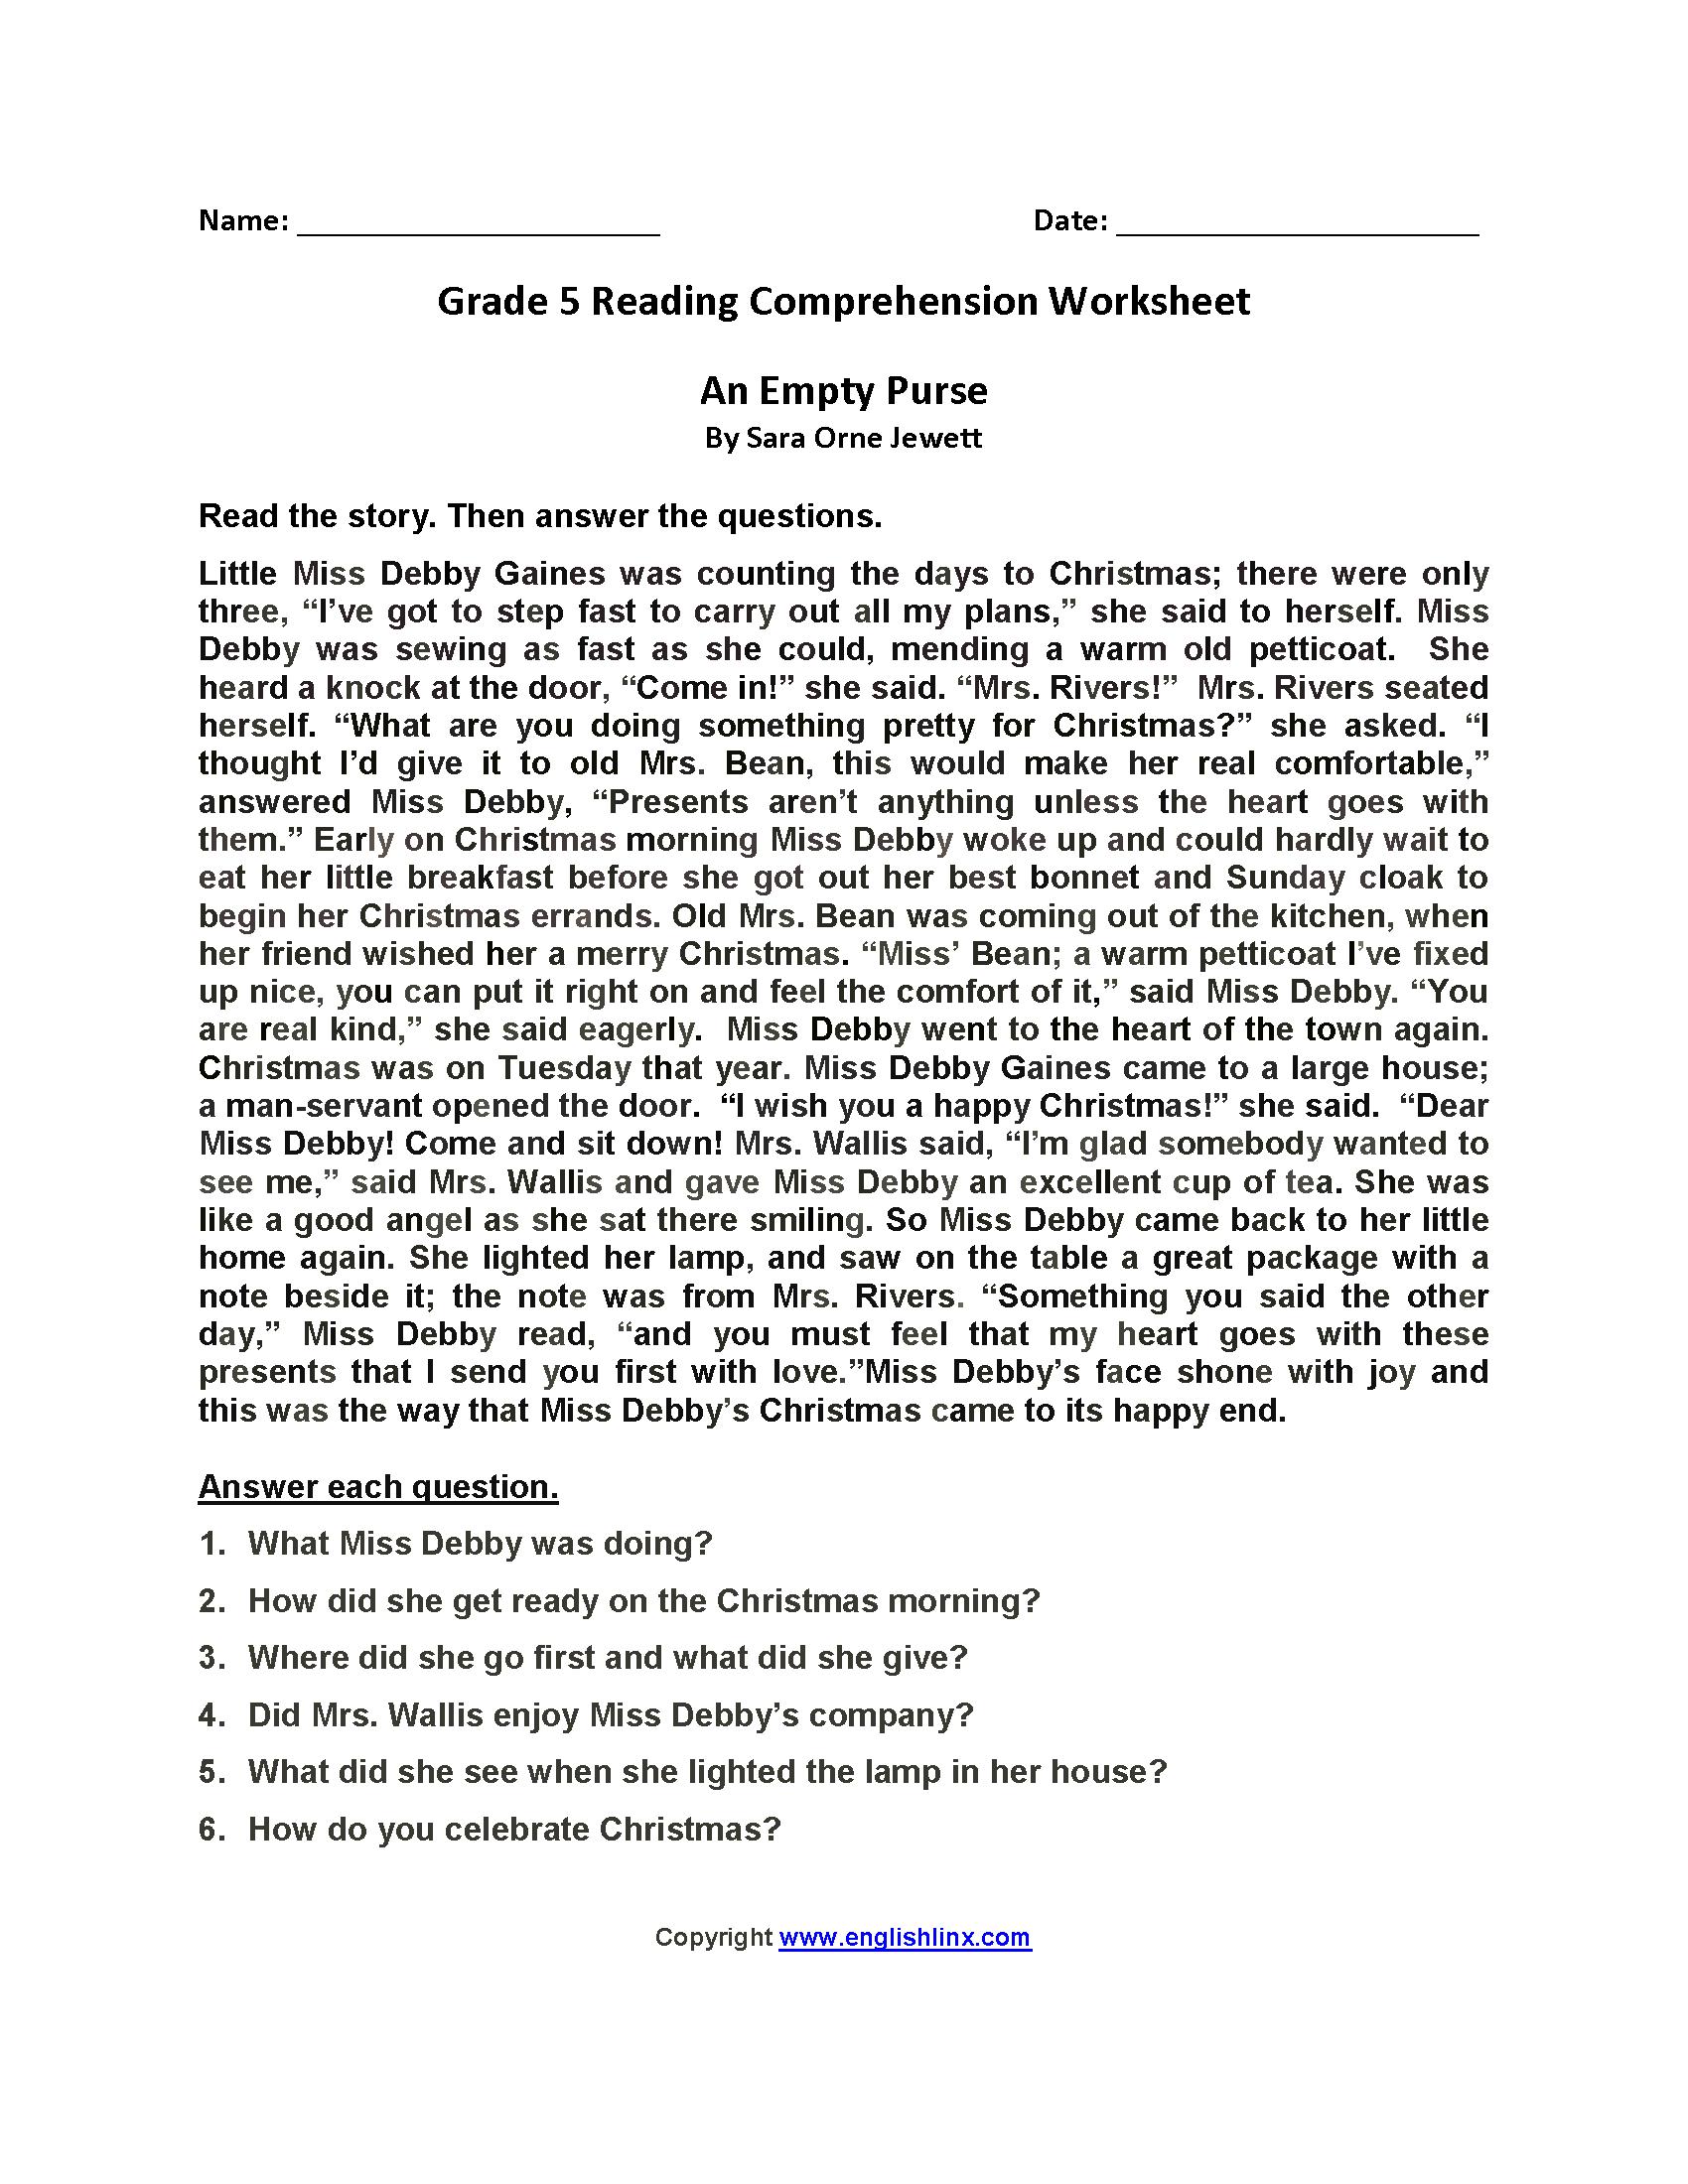 Reading Worksheets  Fifth Grade Reading Worksheets And Comprehension Worksheets For Grade 5